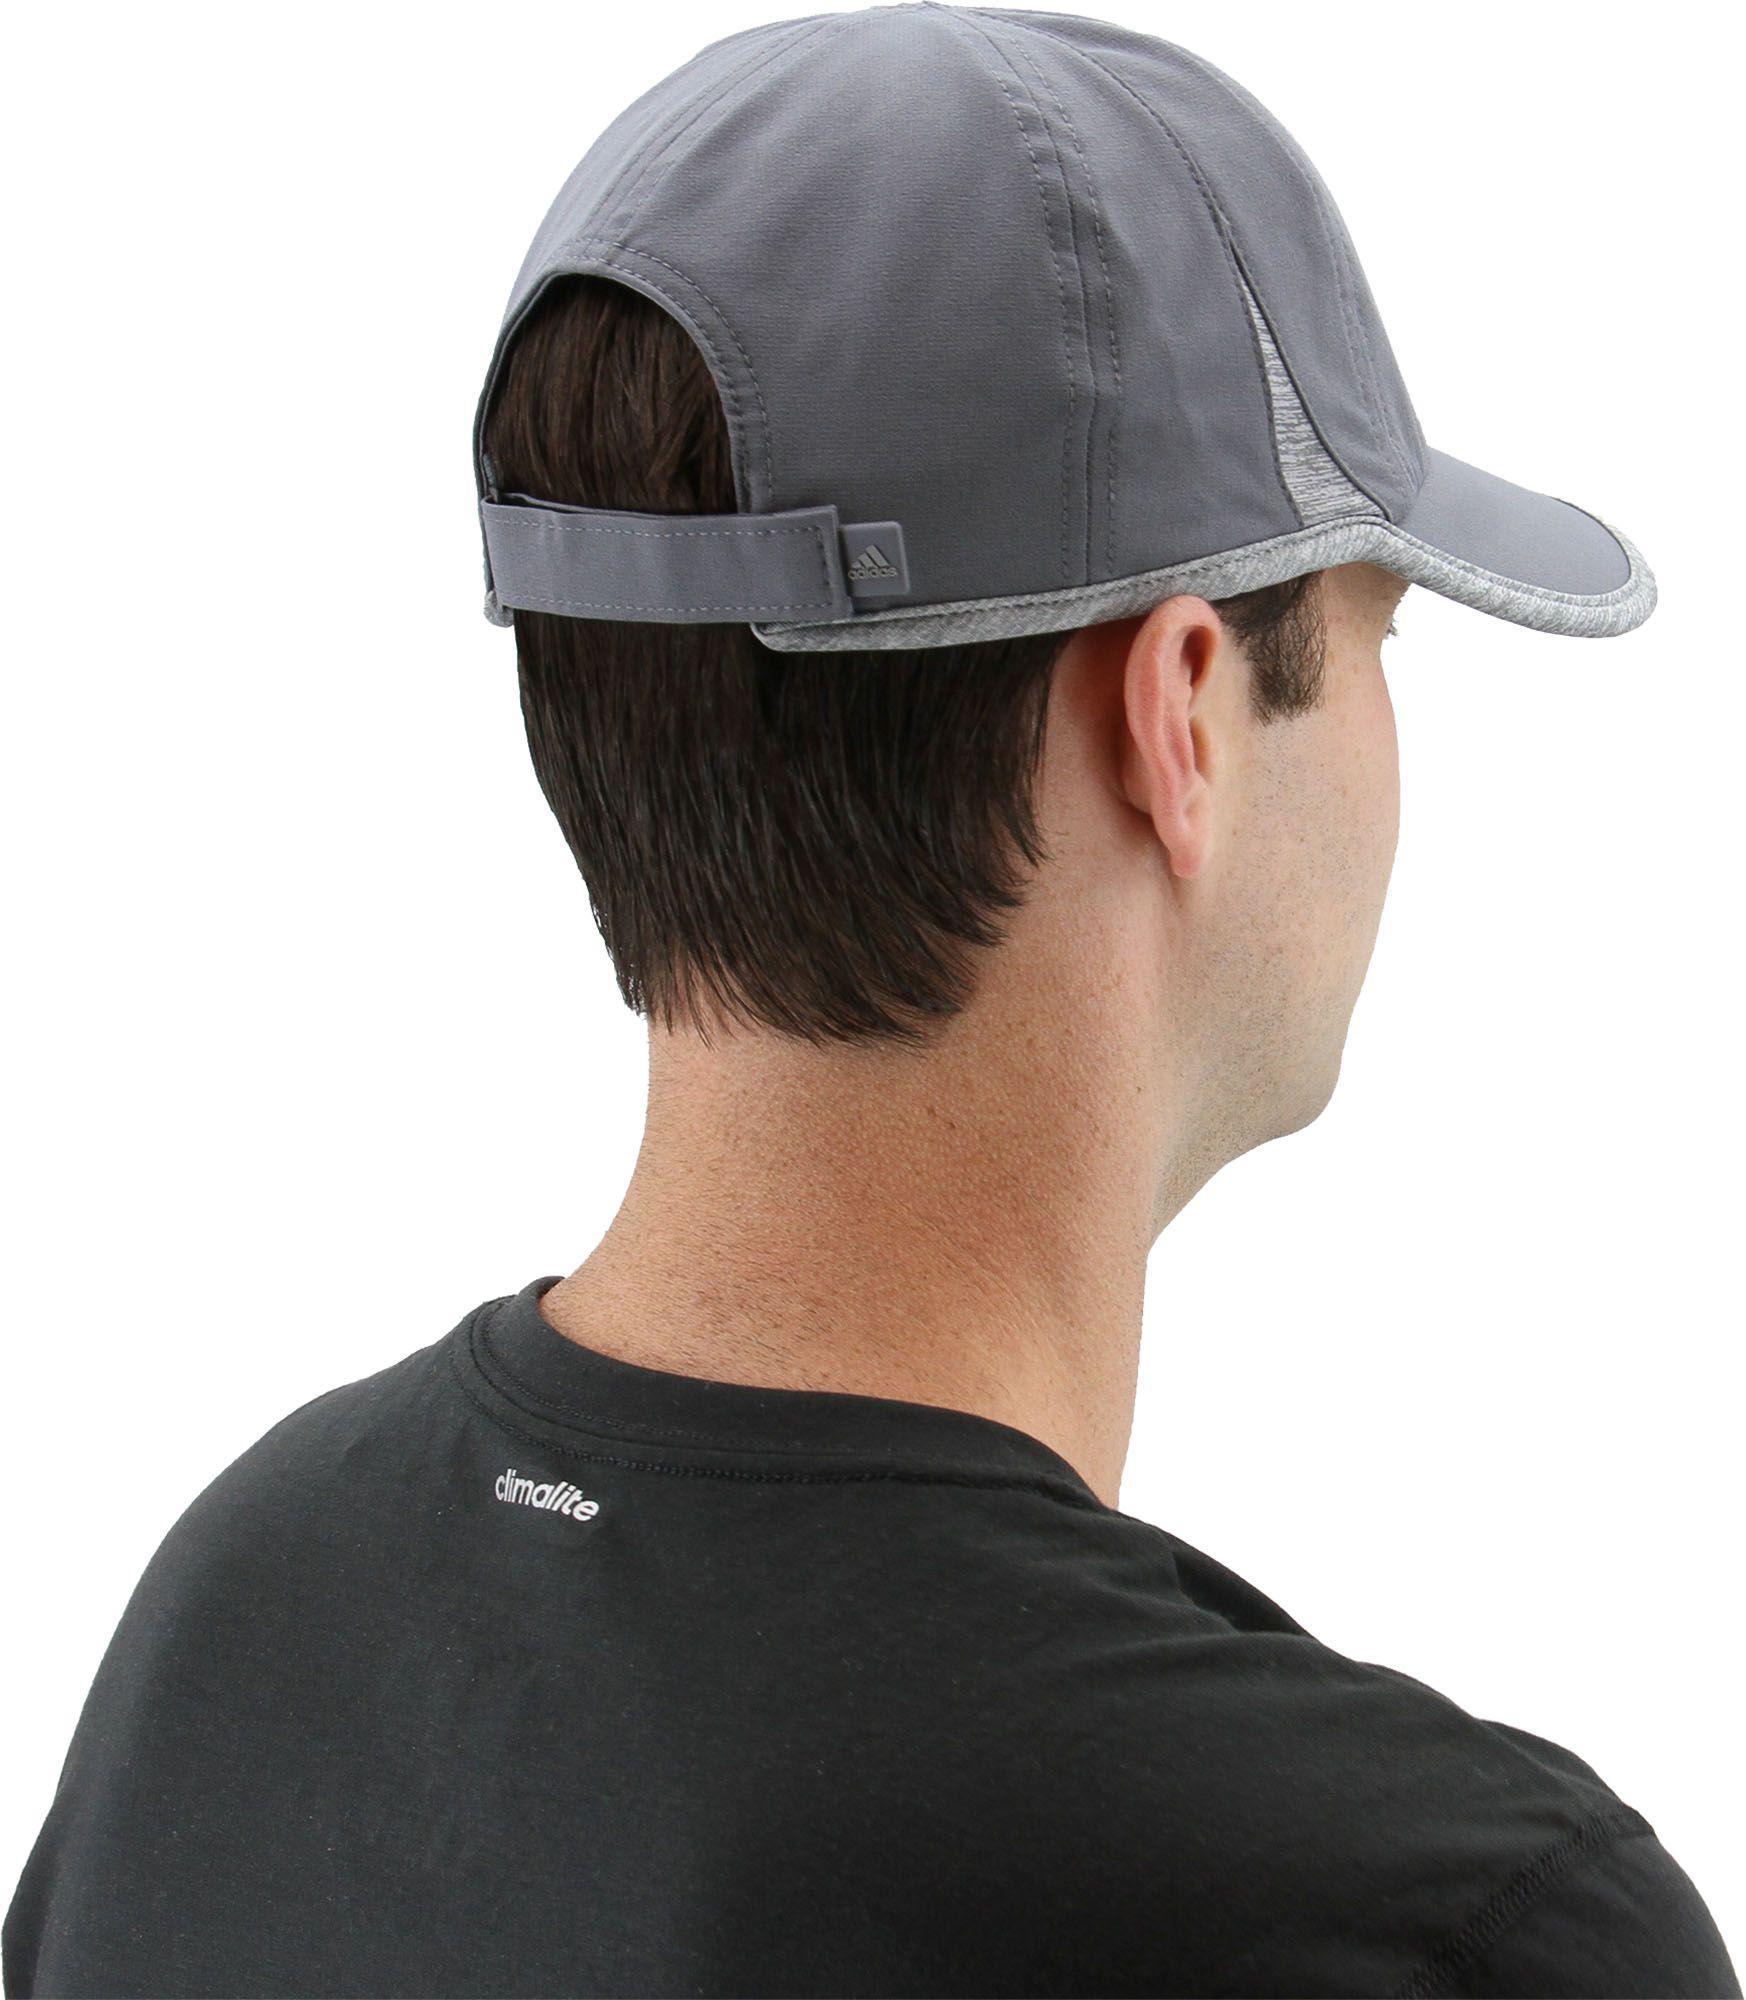 08ea6654fa3 Adidas - Gray Superlite Hat for Men - Lyst. View fullscreen